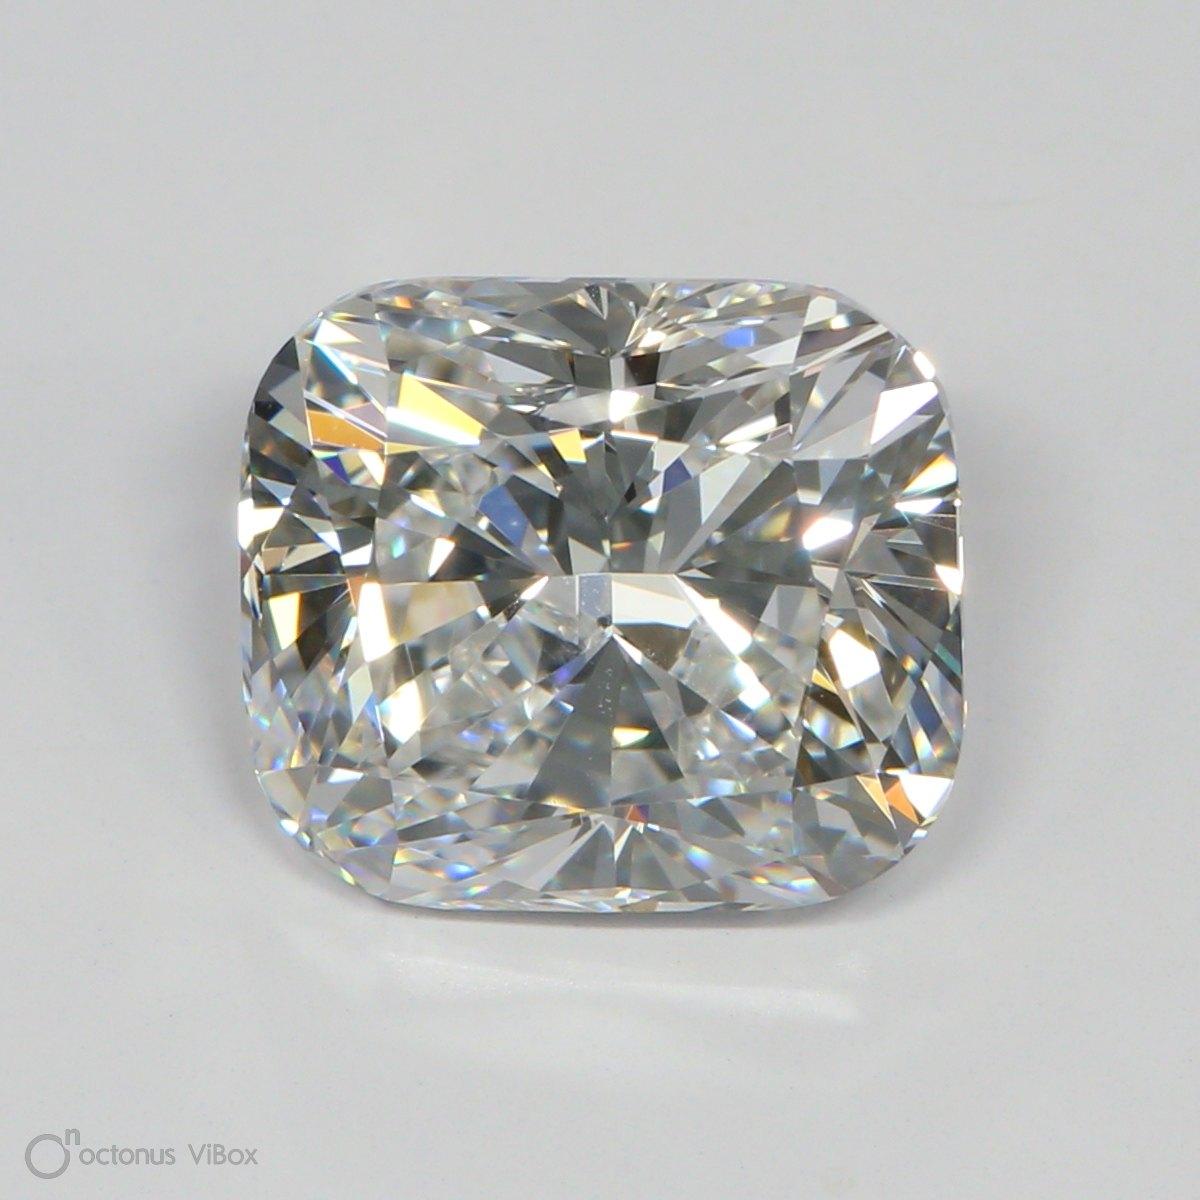 3.26 Carat E-VVS2 Ideal Cushion Diamond